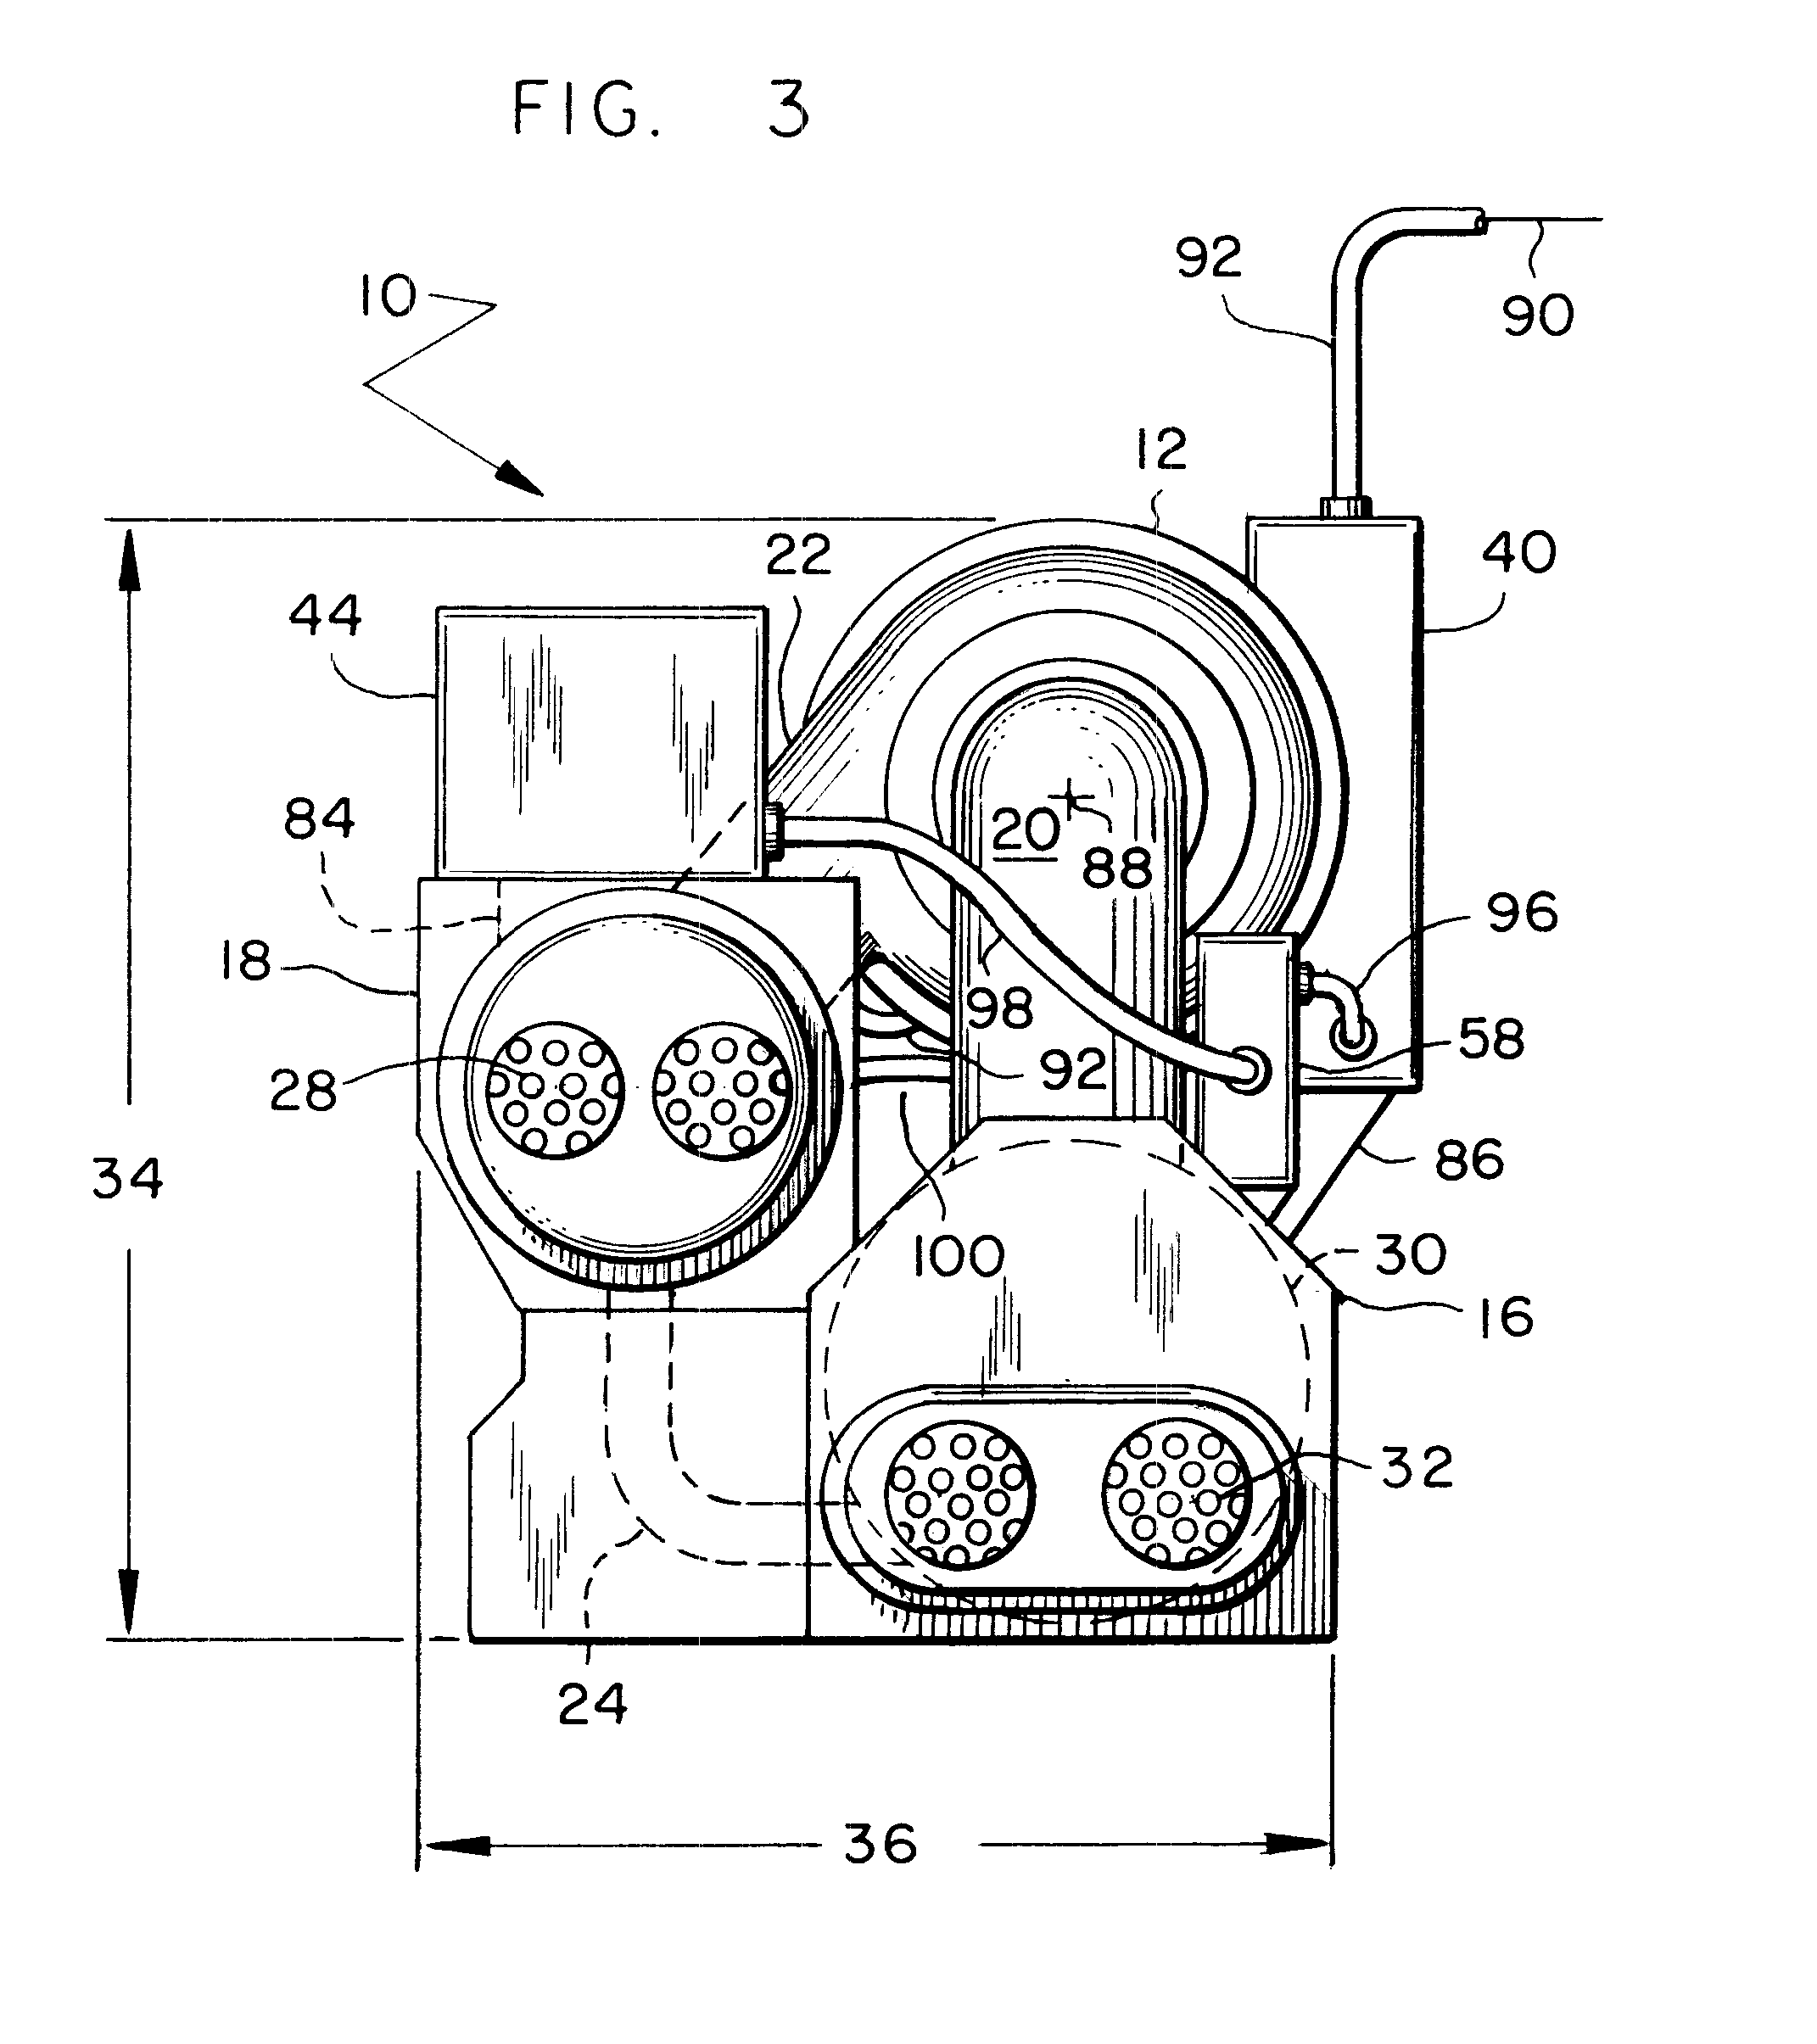 trane xe 1200 heat pump wiring diagram mercedes sprinter diagrams for xv80 xl80